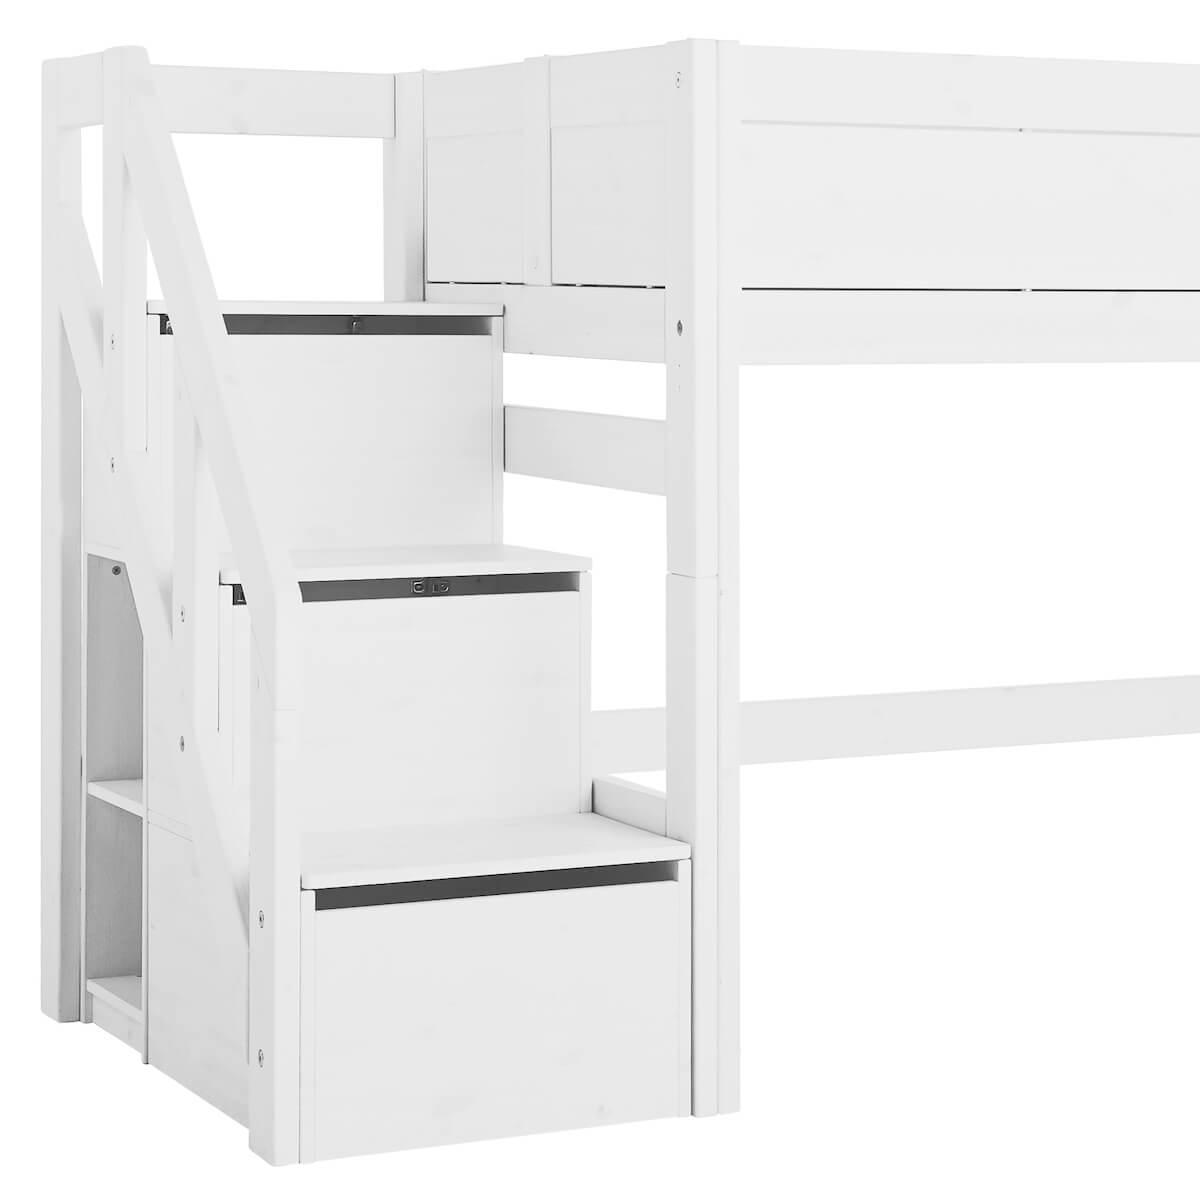 Niedriges Spielbett 90x200cm Treppenmodul Lifetime Blanc